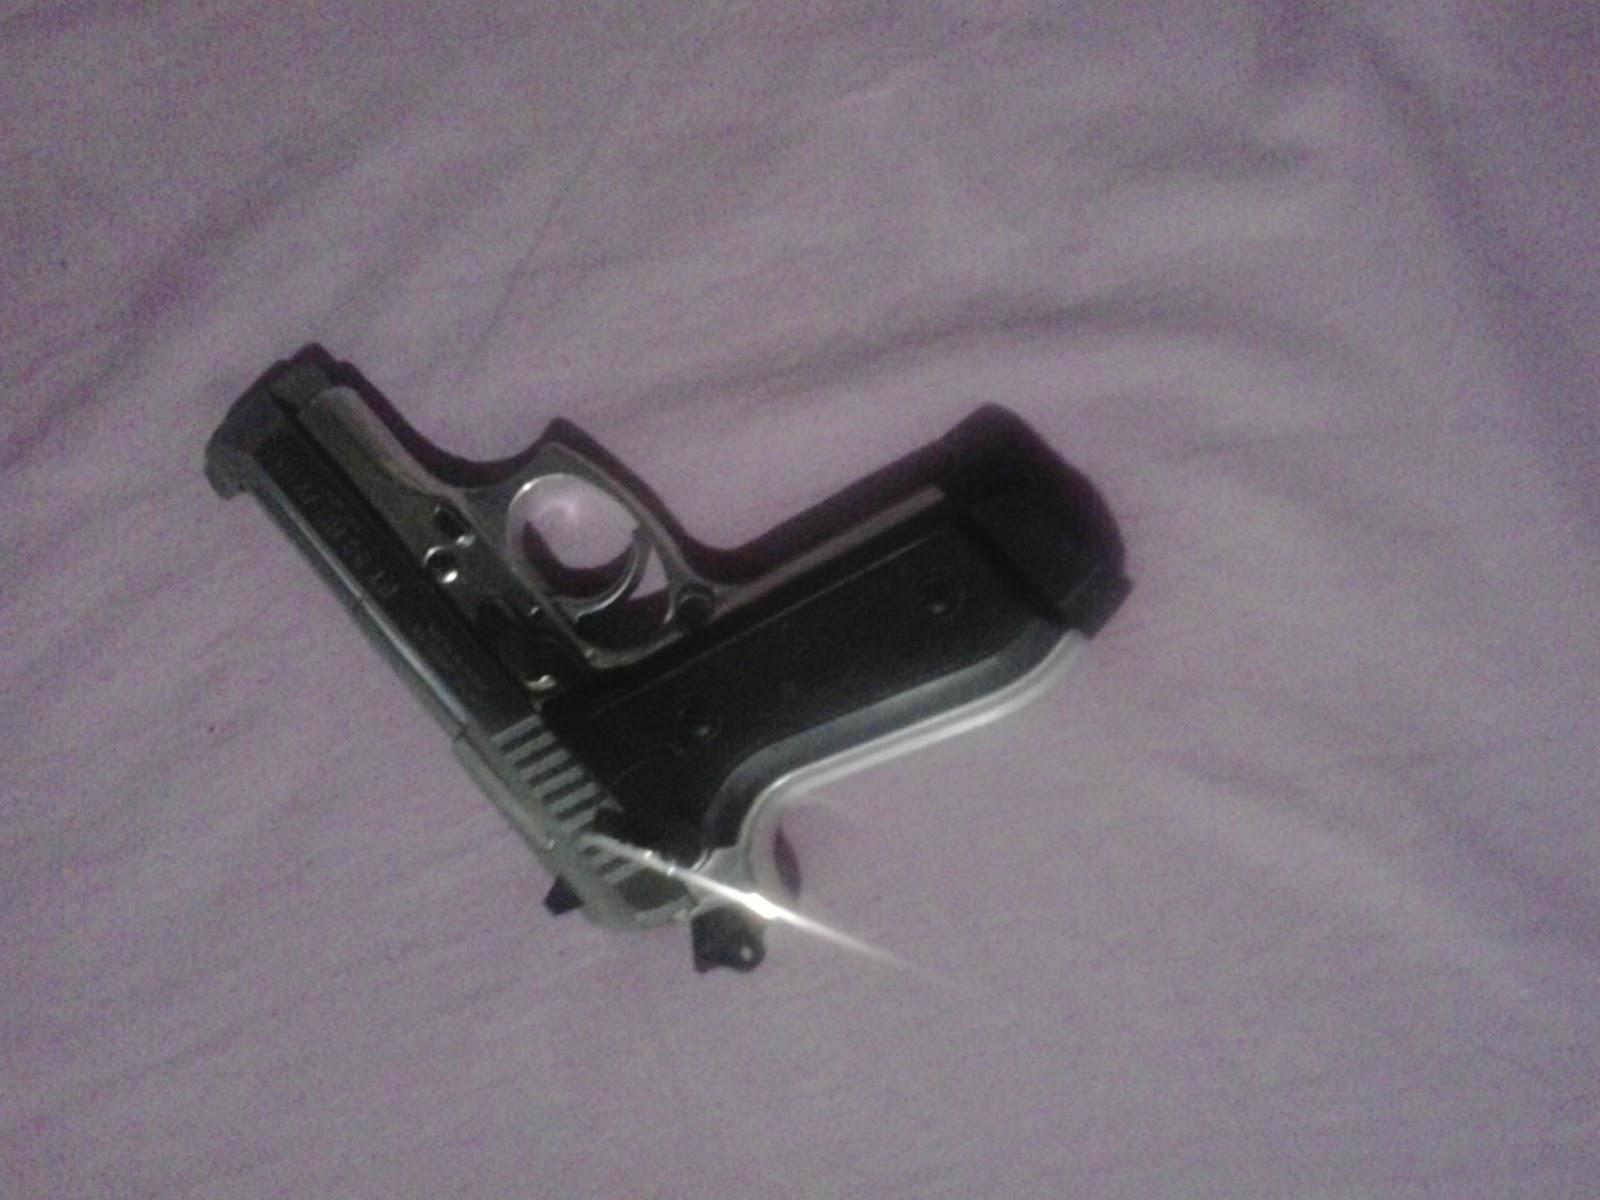 Manual Pistola Taurus Pt100 Millennium 9mm Schematics Liberador Del Bloqueo De Seguridad Txt Read My Can Tell Just Holding Taking Apart Inspecting Way Beyond Agrees Million Settlement Defective Case